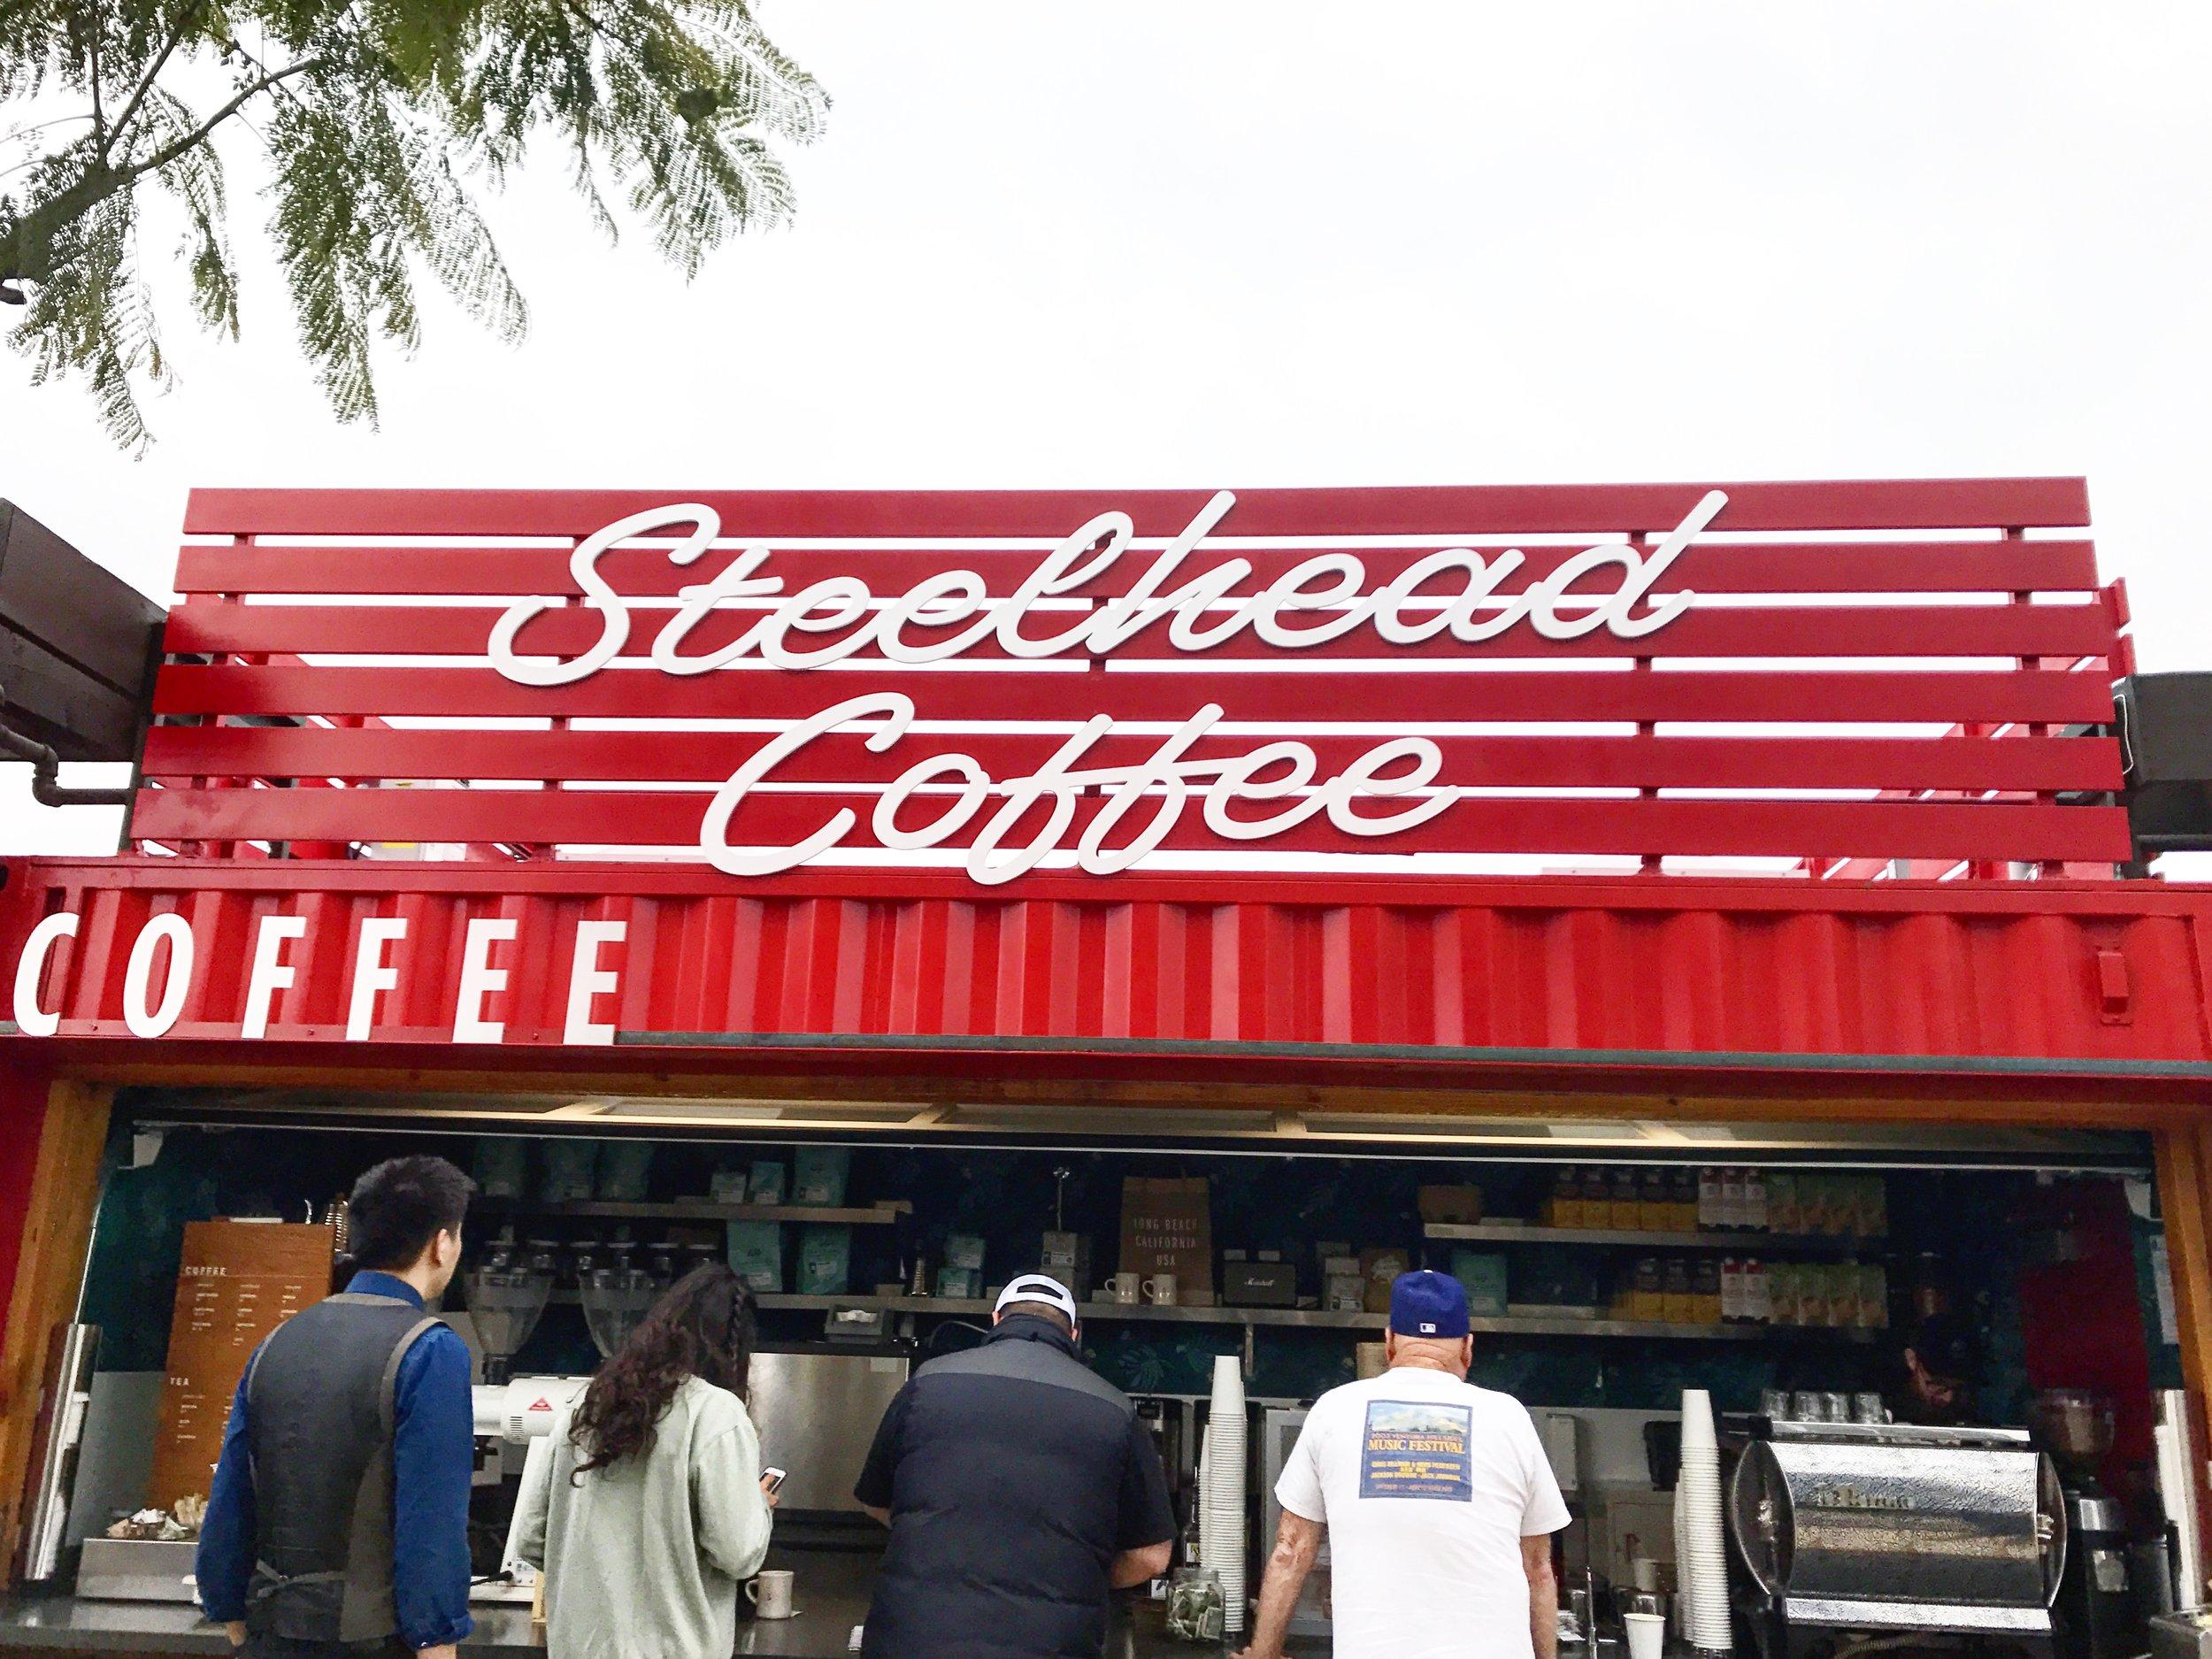 Outside of Steelhead Coffee